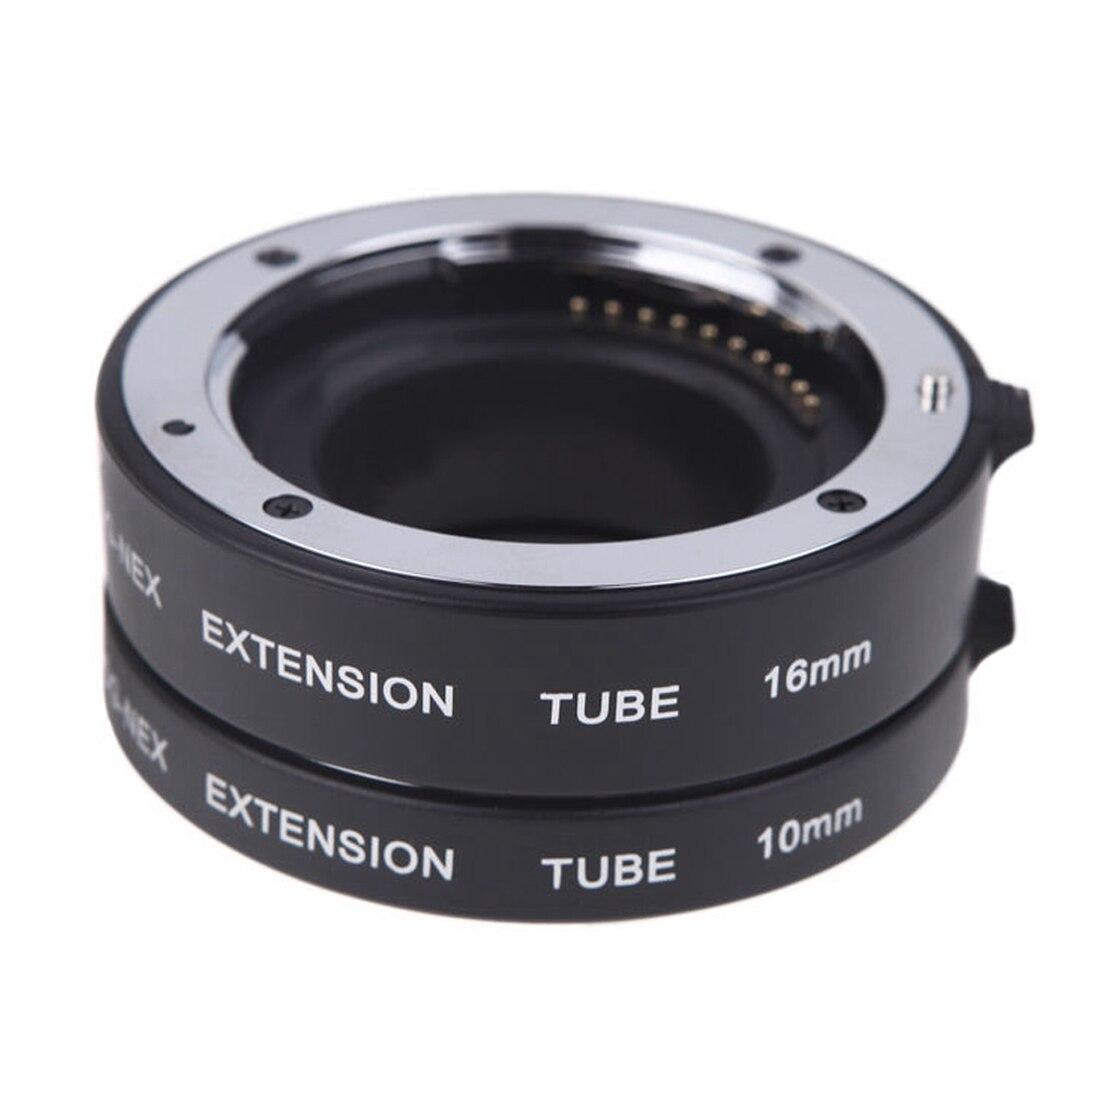 Wholesale5pcs*Macro Auto Focus Extension DG Tube Set Ring Metal Mount for Sony E-mout NEX macro extension tube for sony e mount ac ms silver grey